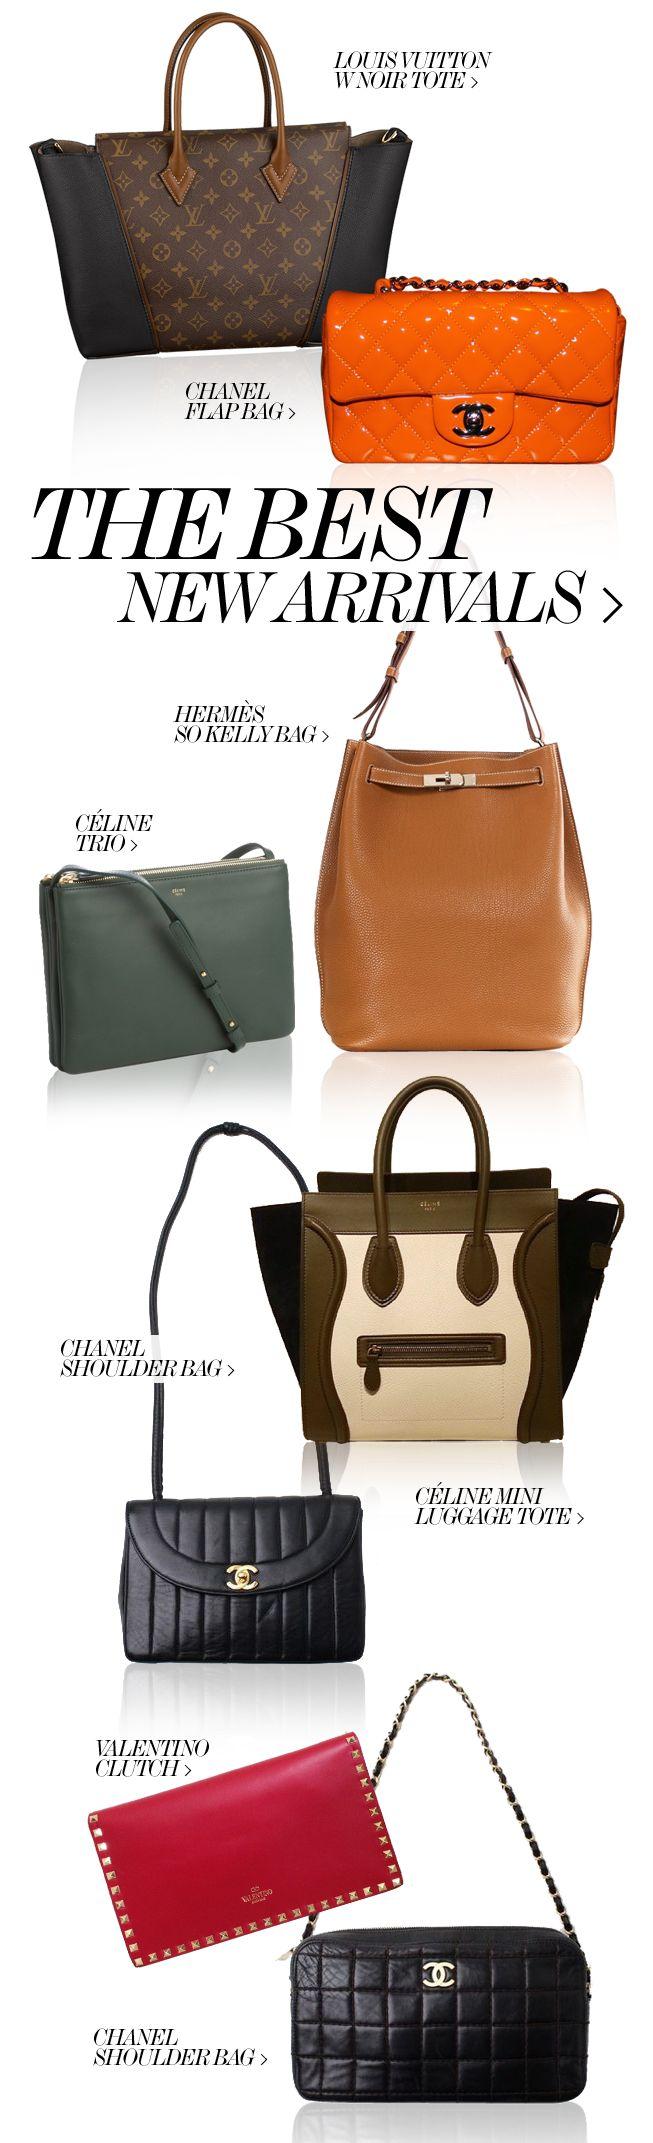 THE BEST NEW ARRIVALS  //  Louis Vuitton, Chanel, Hermès, Céline  Valentino!